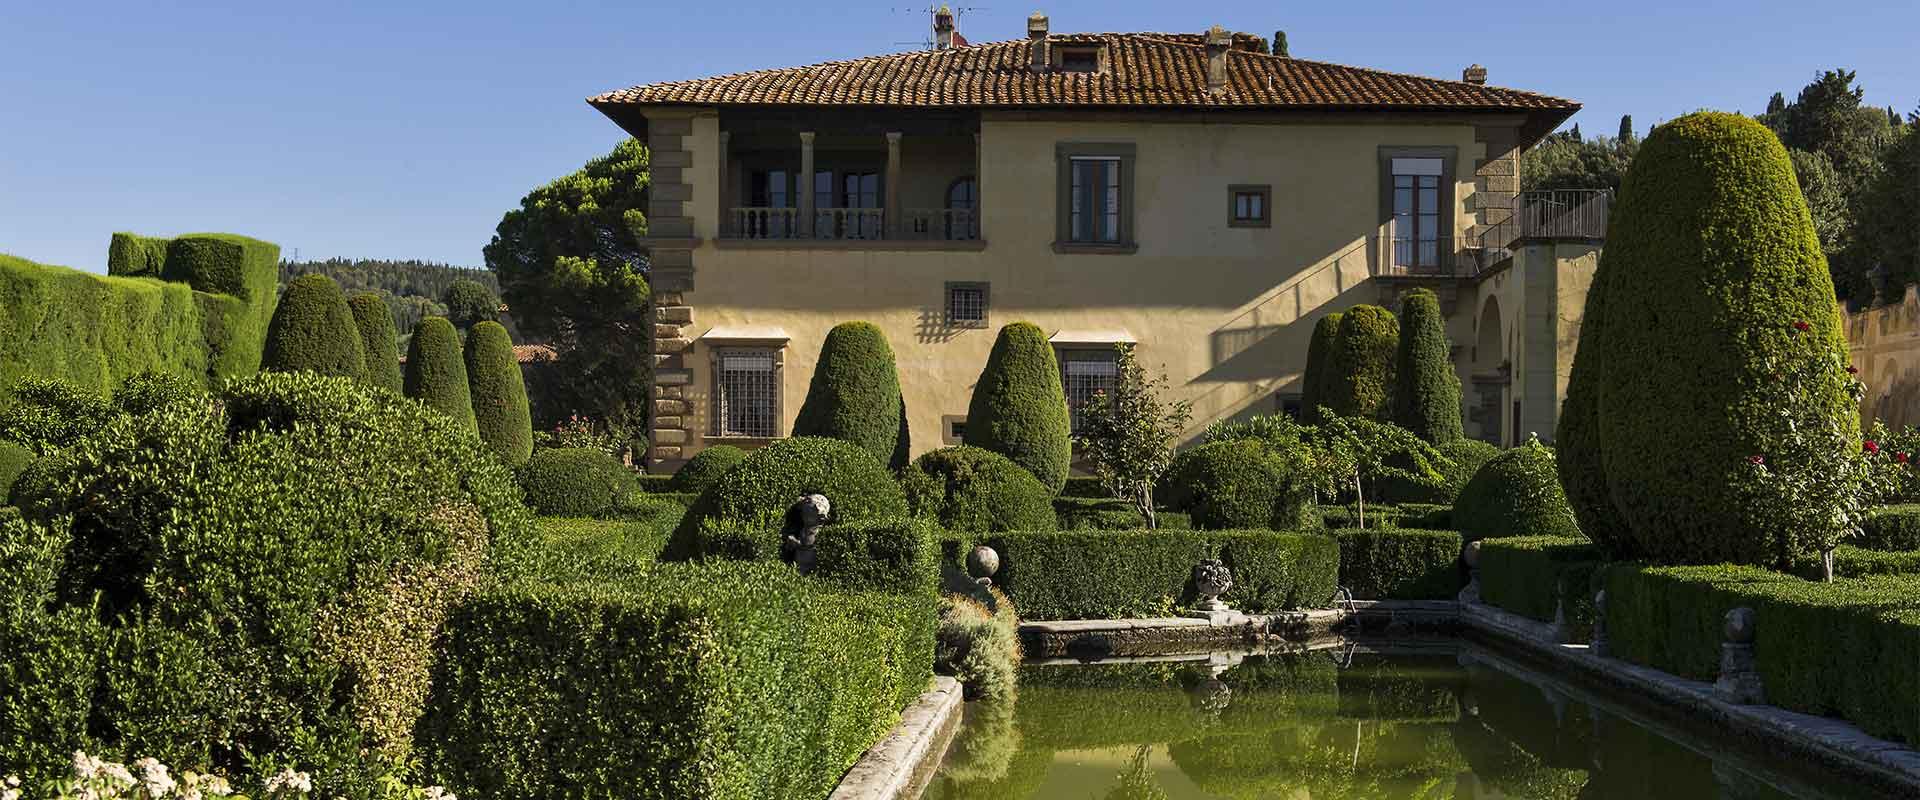 Villa-Gamberaia-home